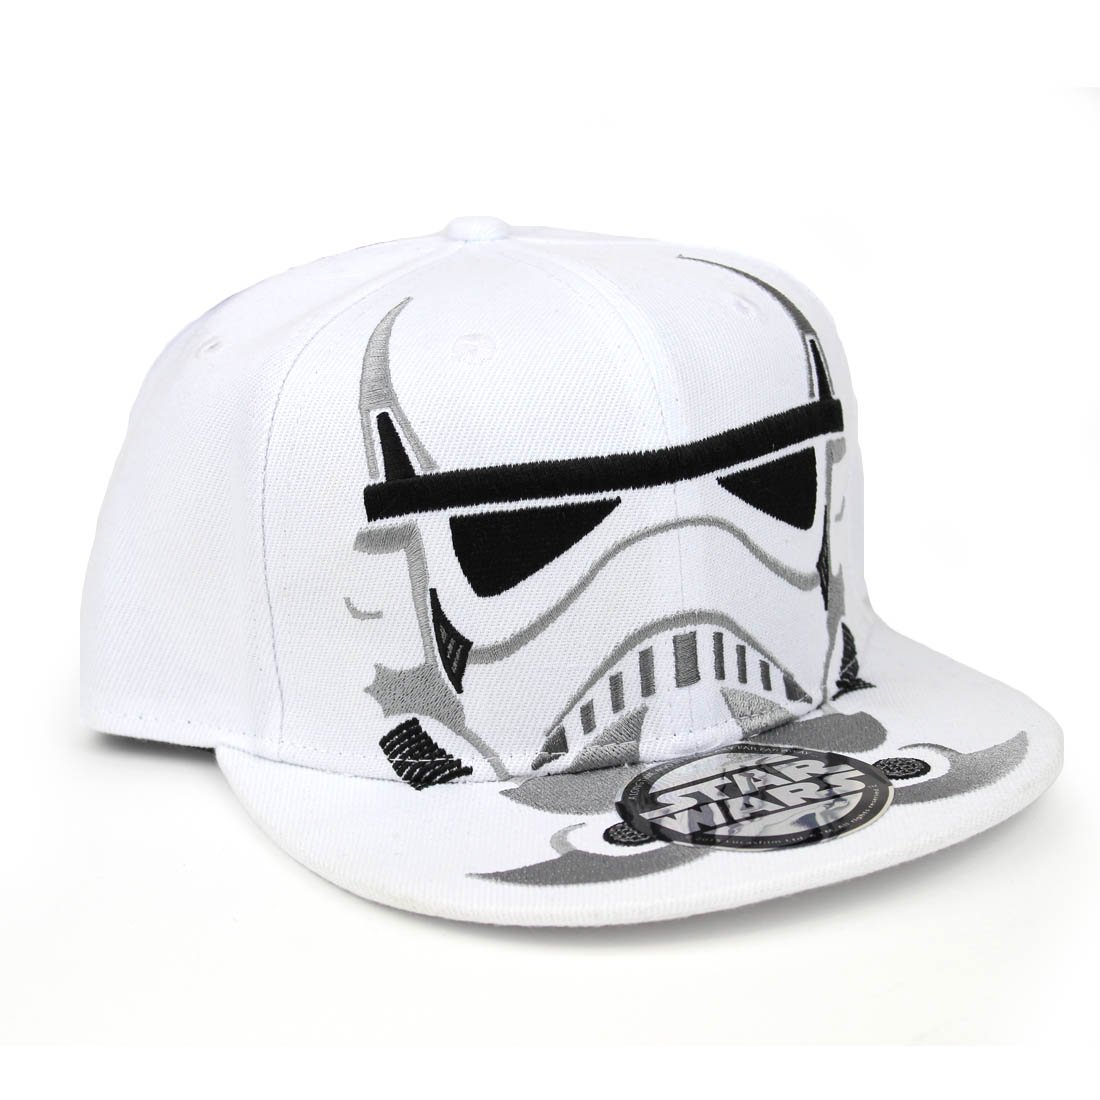 2b5833db4 Star Wars Stormtrooper Men's Snapback Baseball CAP White / Silver ...